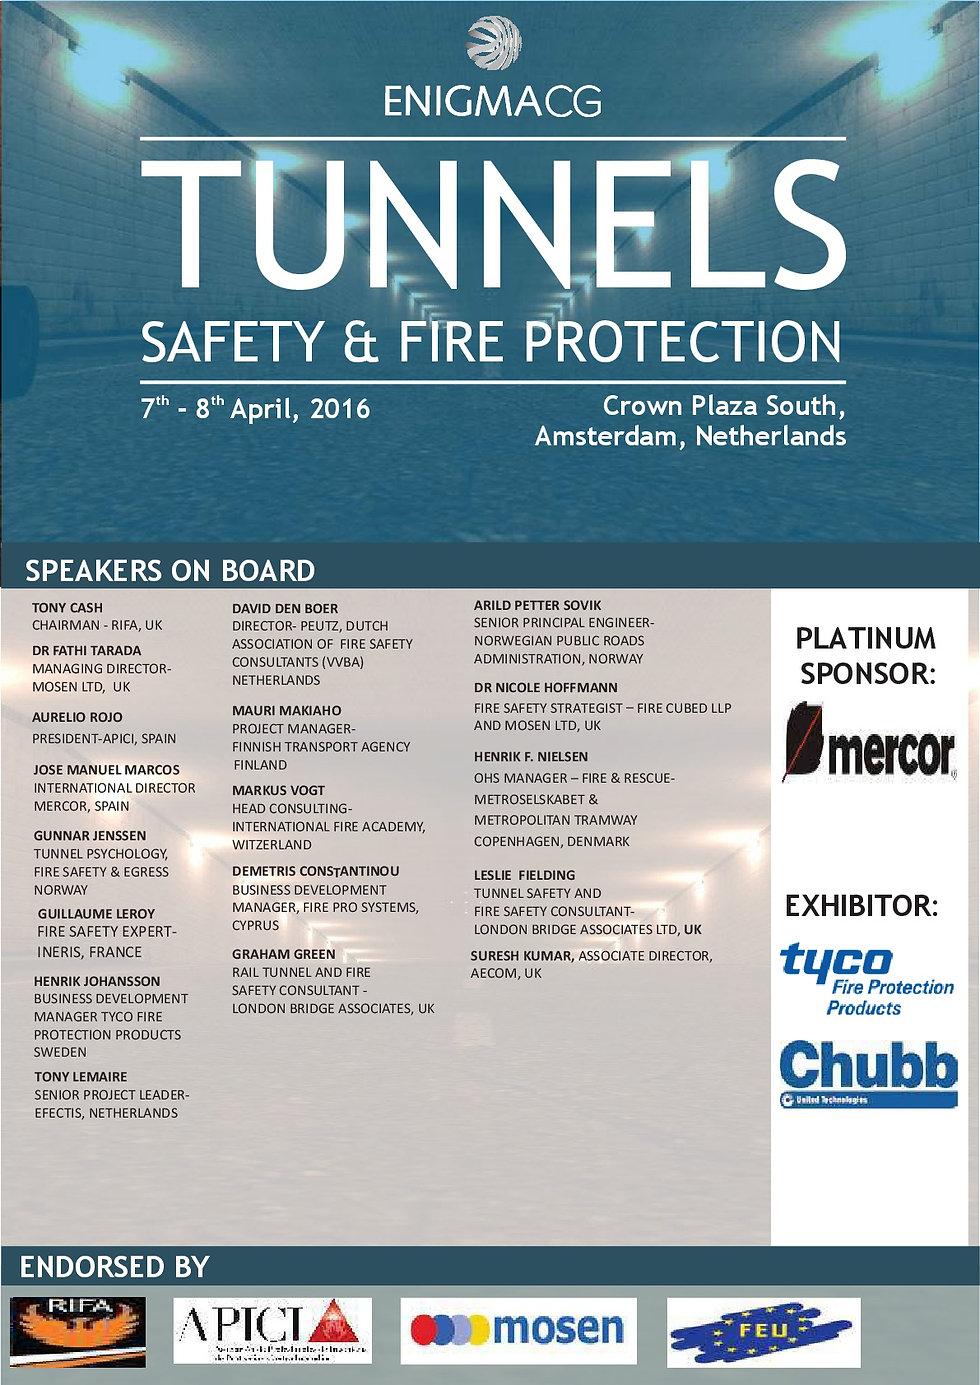 tunnels-2016-001.jpg